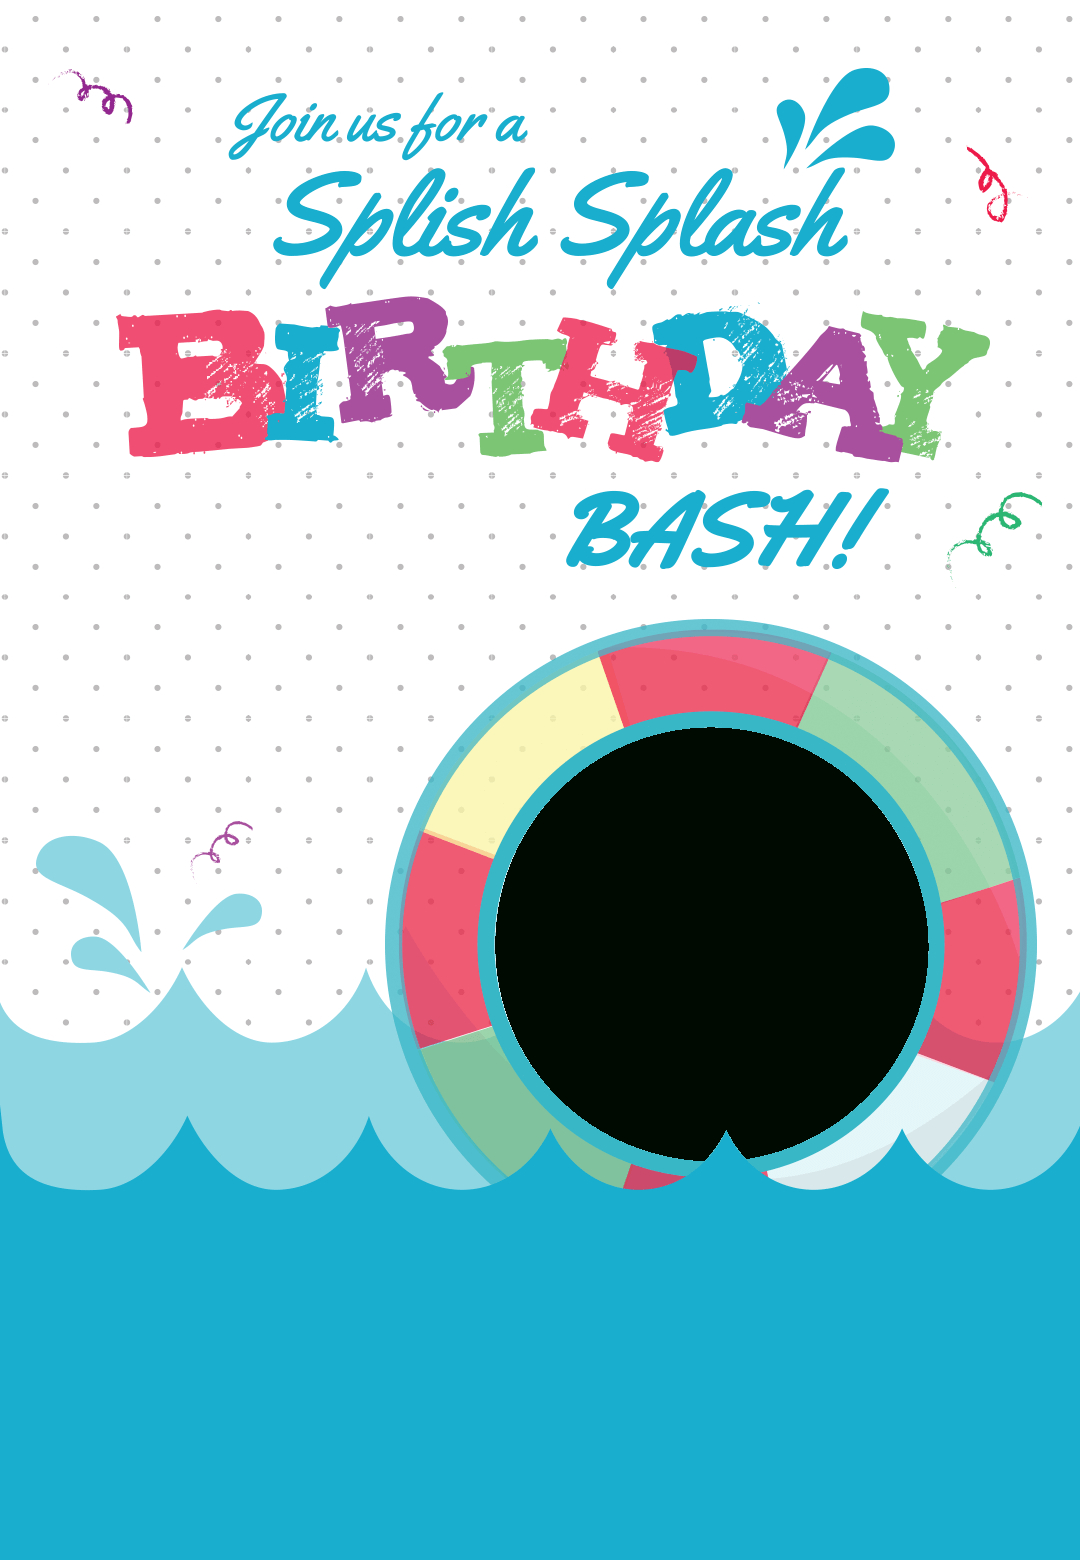 Splish Splash - Free Printable Summer Party Invitation Template - Free Printable Water Birthday Party Invitations